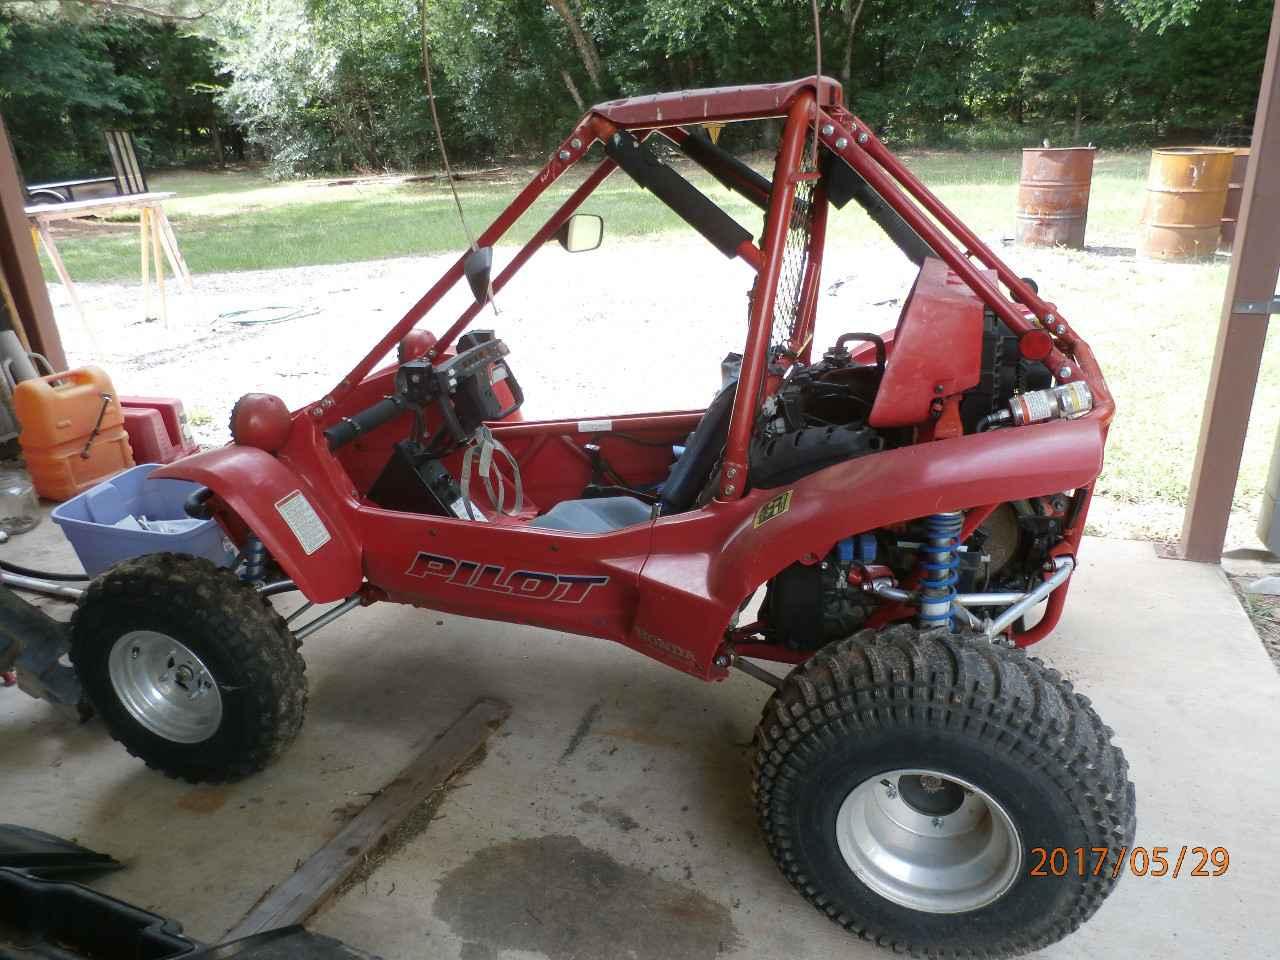 Used 1989 Honda PILOT FL400 ATVs For Sale In Texas $5,000